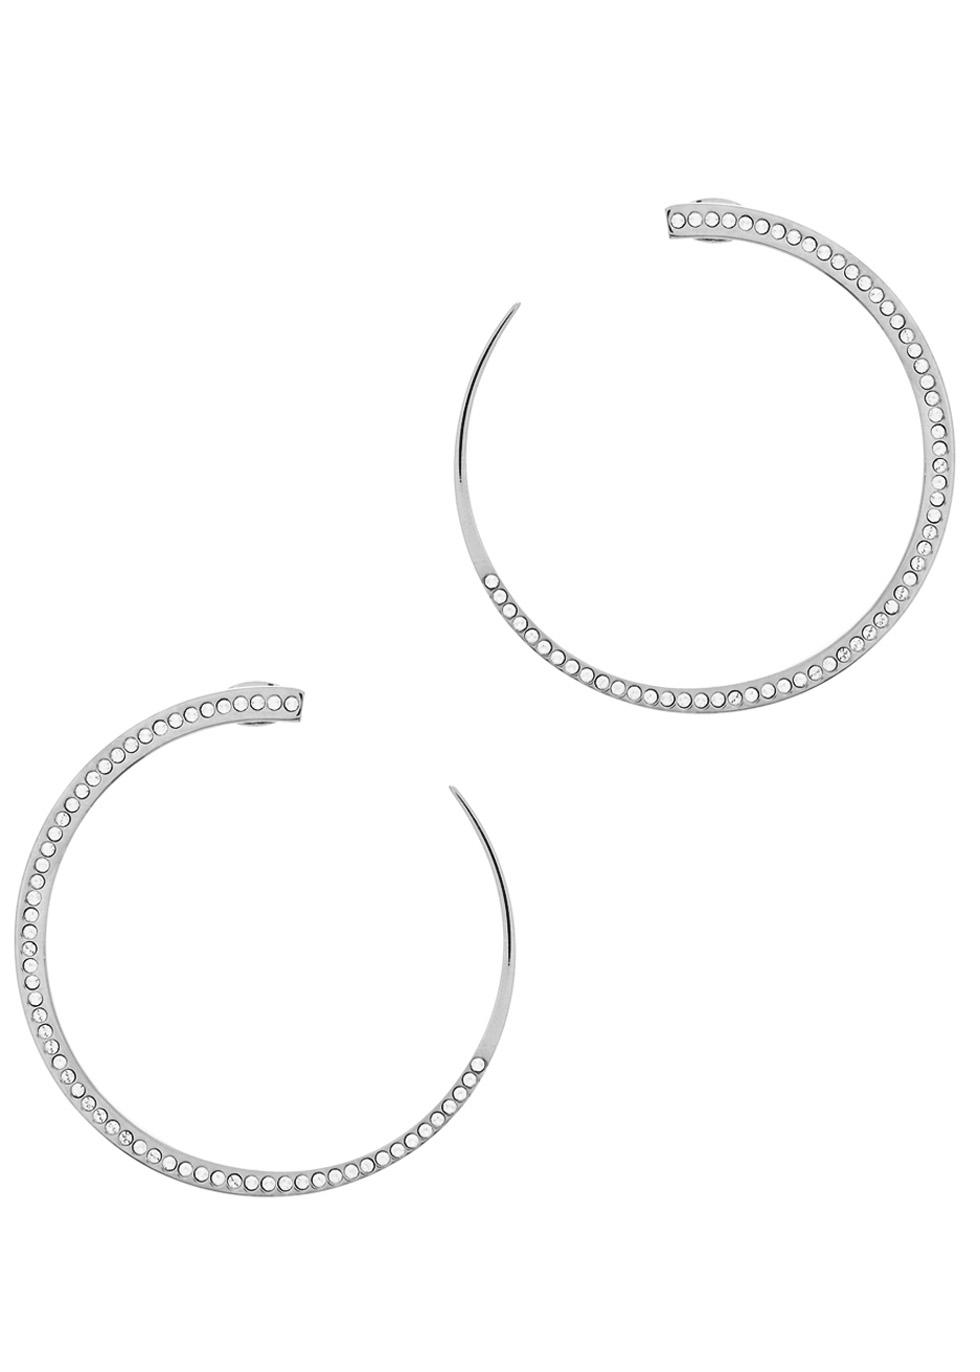 VITA FEDE MOON CRYSTAL SILVER-PLATED EARRINGS